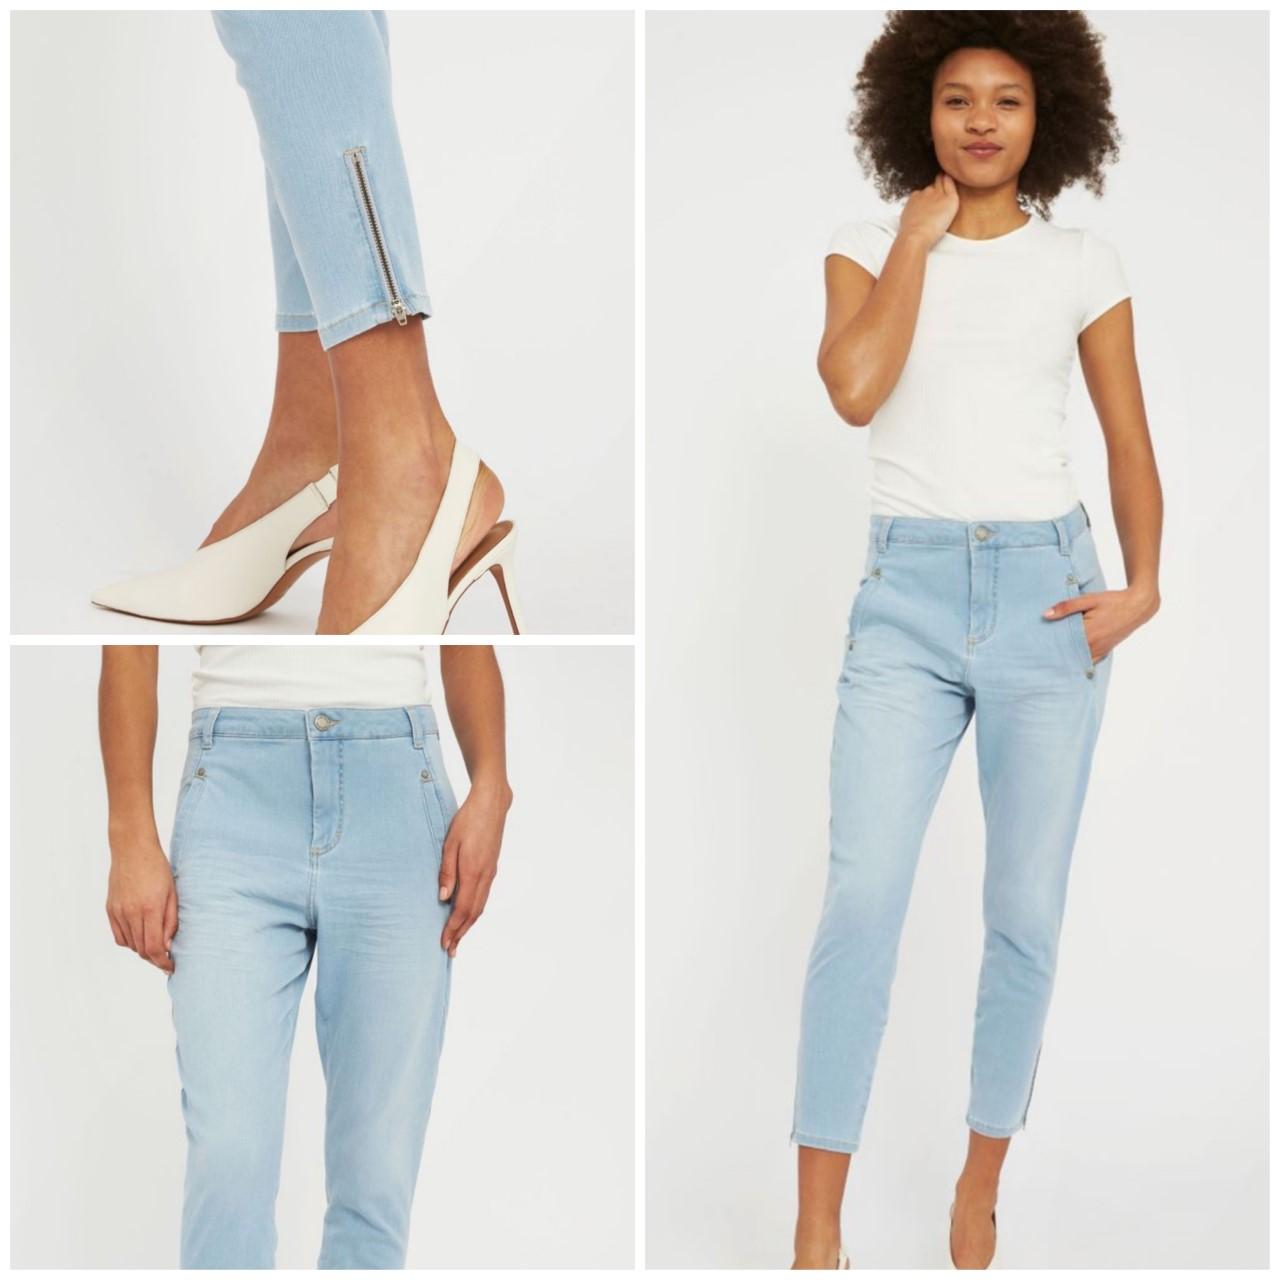 FiveUnits Jolie zip blue